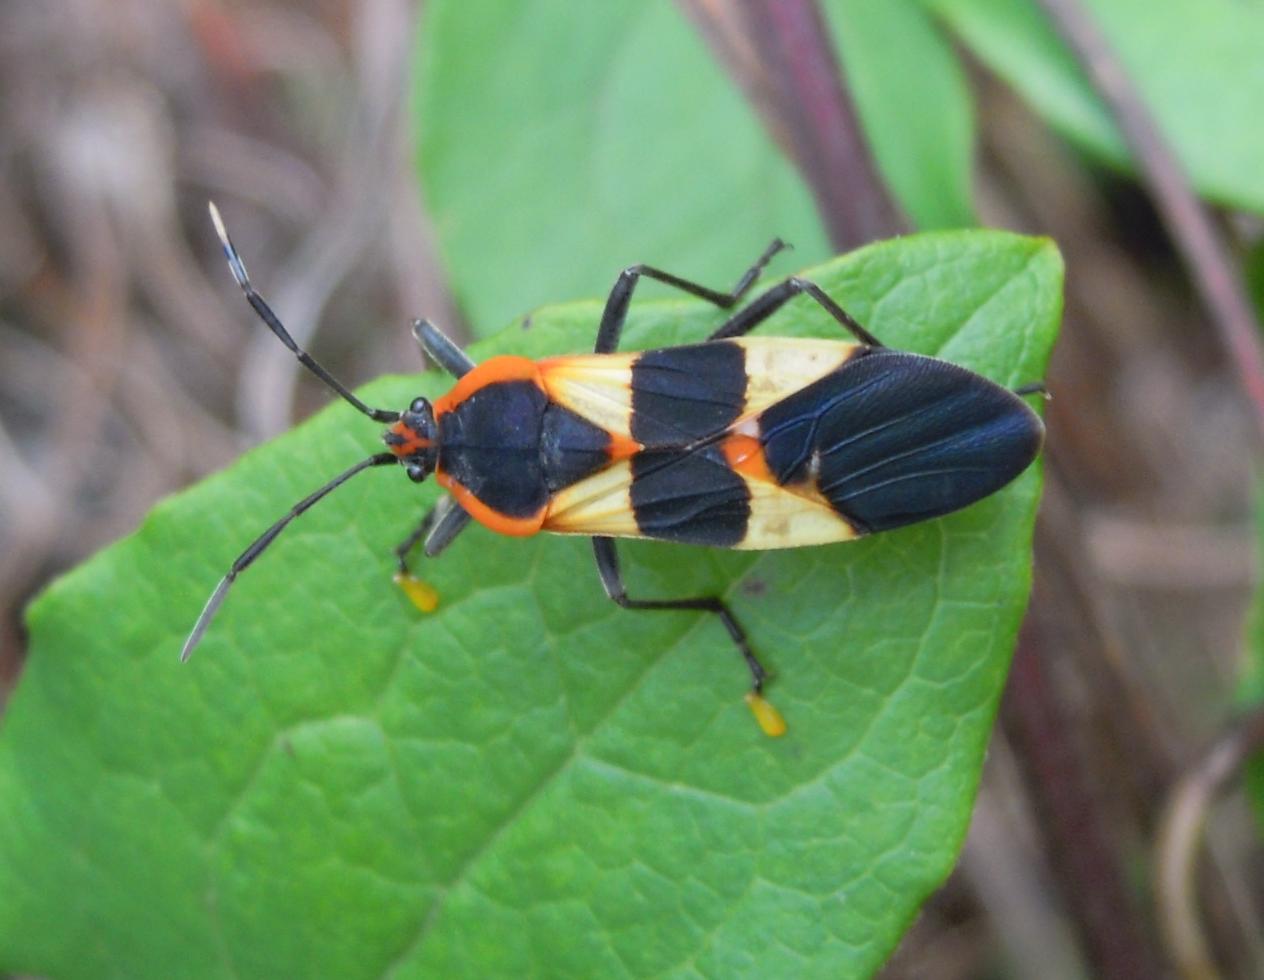 FishnDave: Backyard Bug Pics